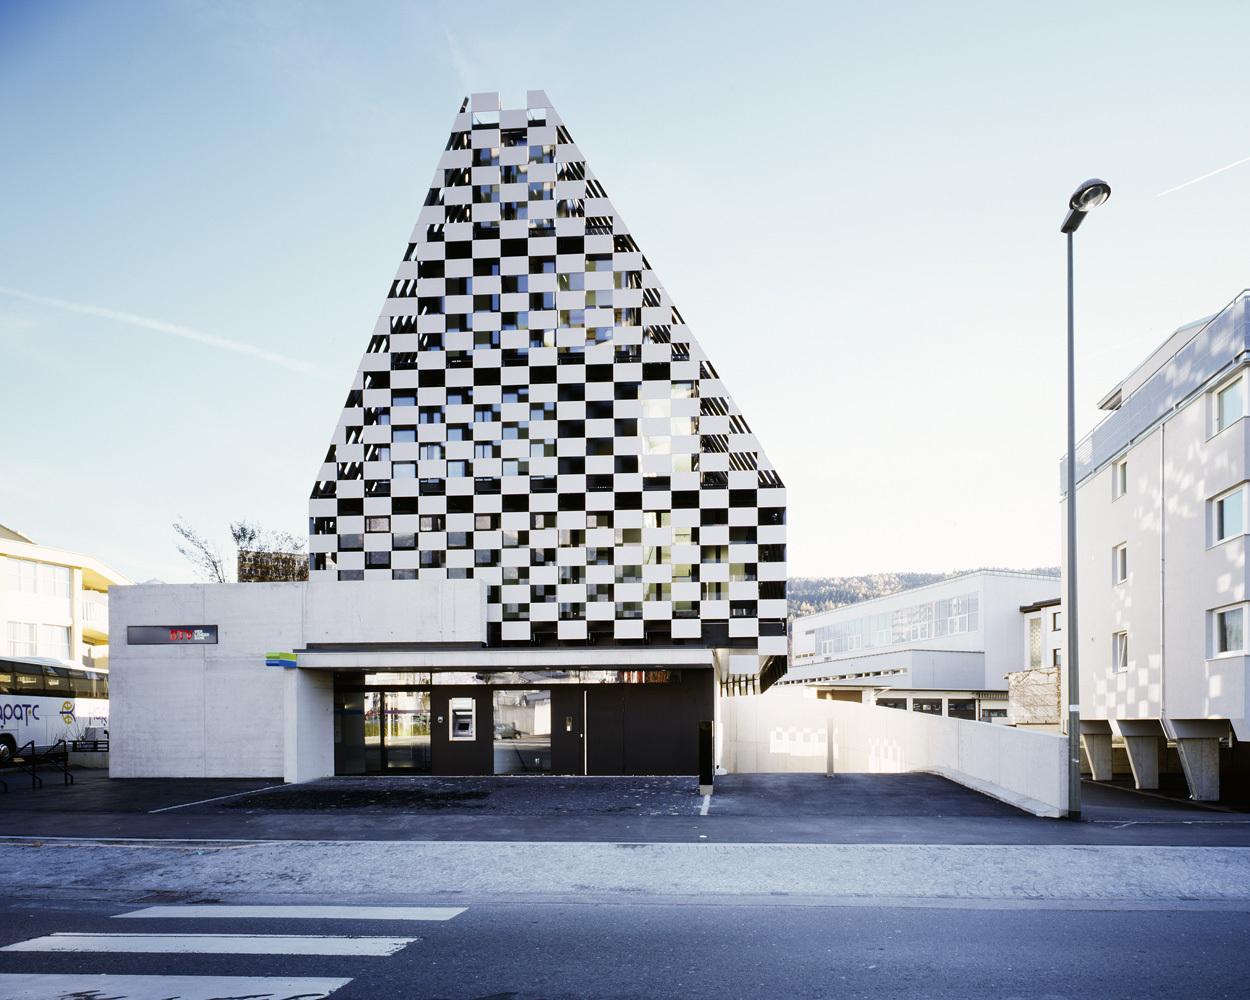 Filial do BTV em Innsbruck / Rainer Köberl, © Lucas Shaller